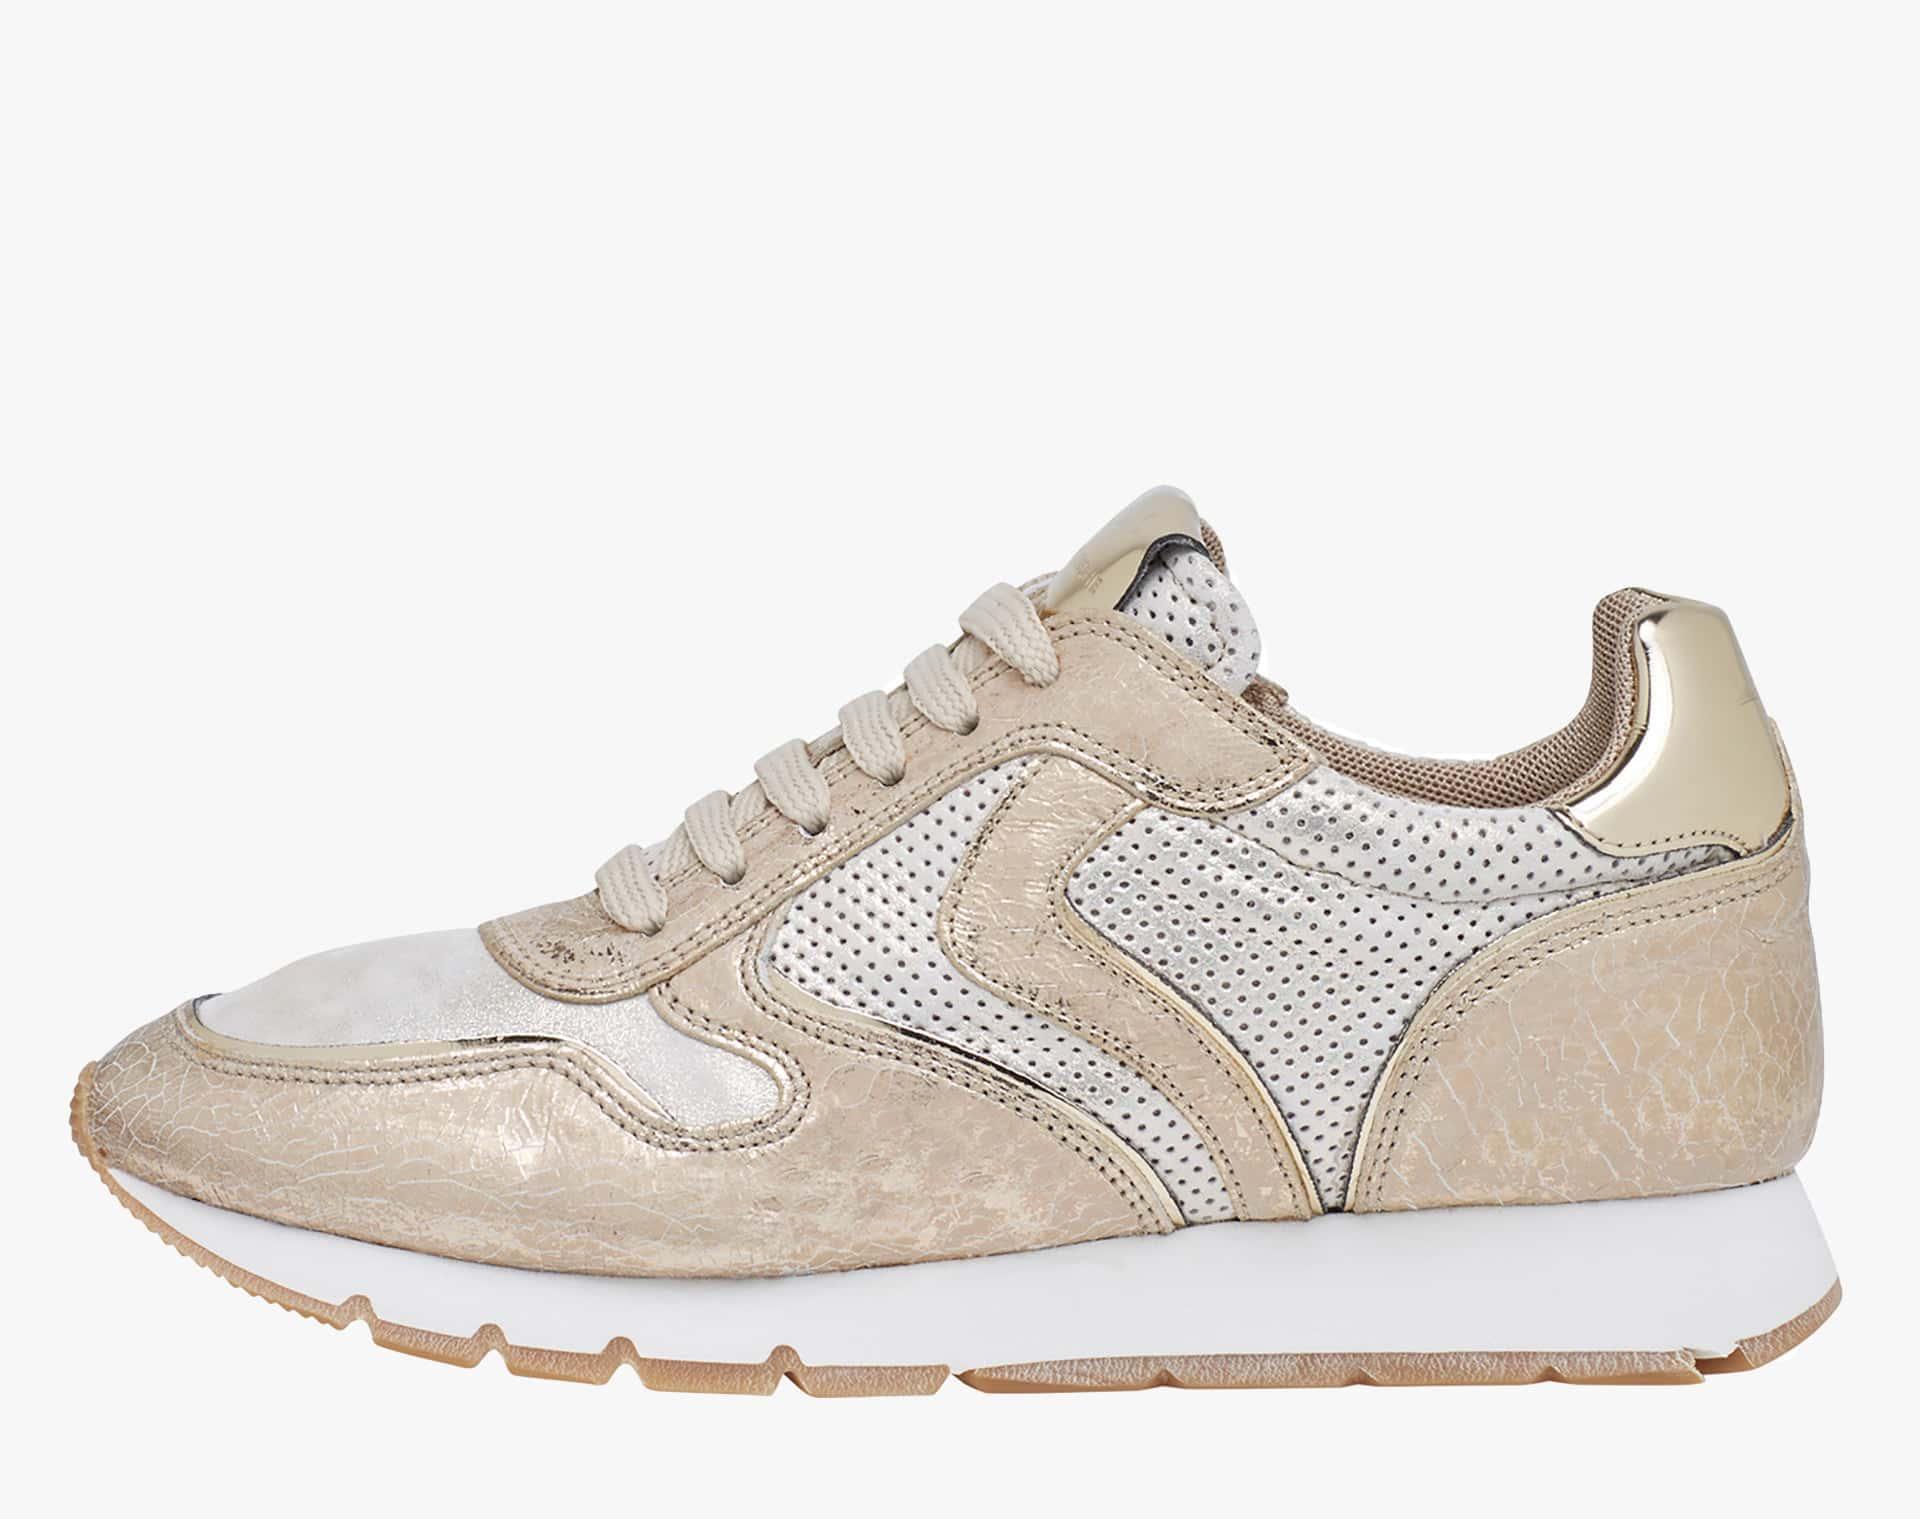 JULIA - Sneakers in pelle - Platino